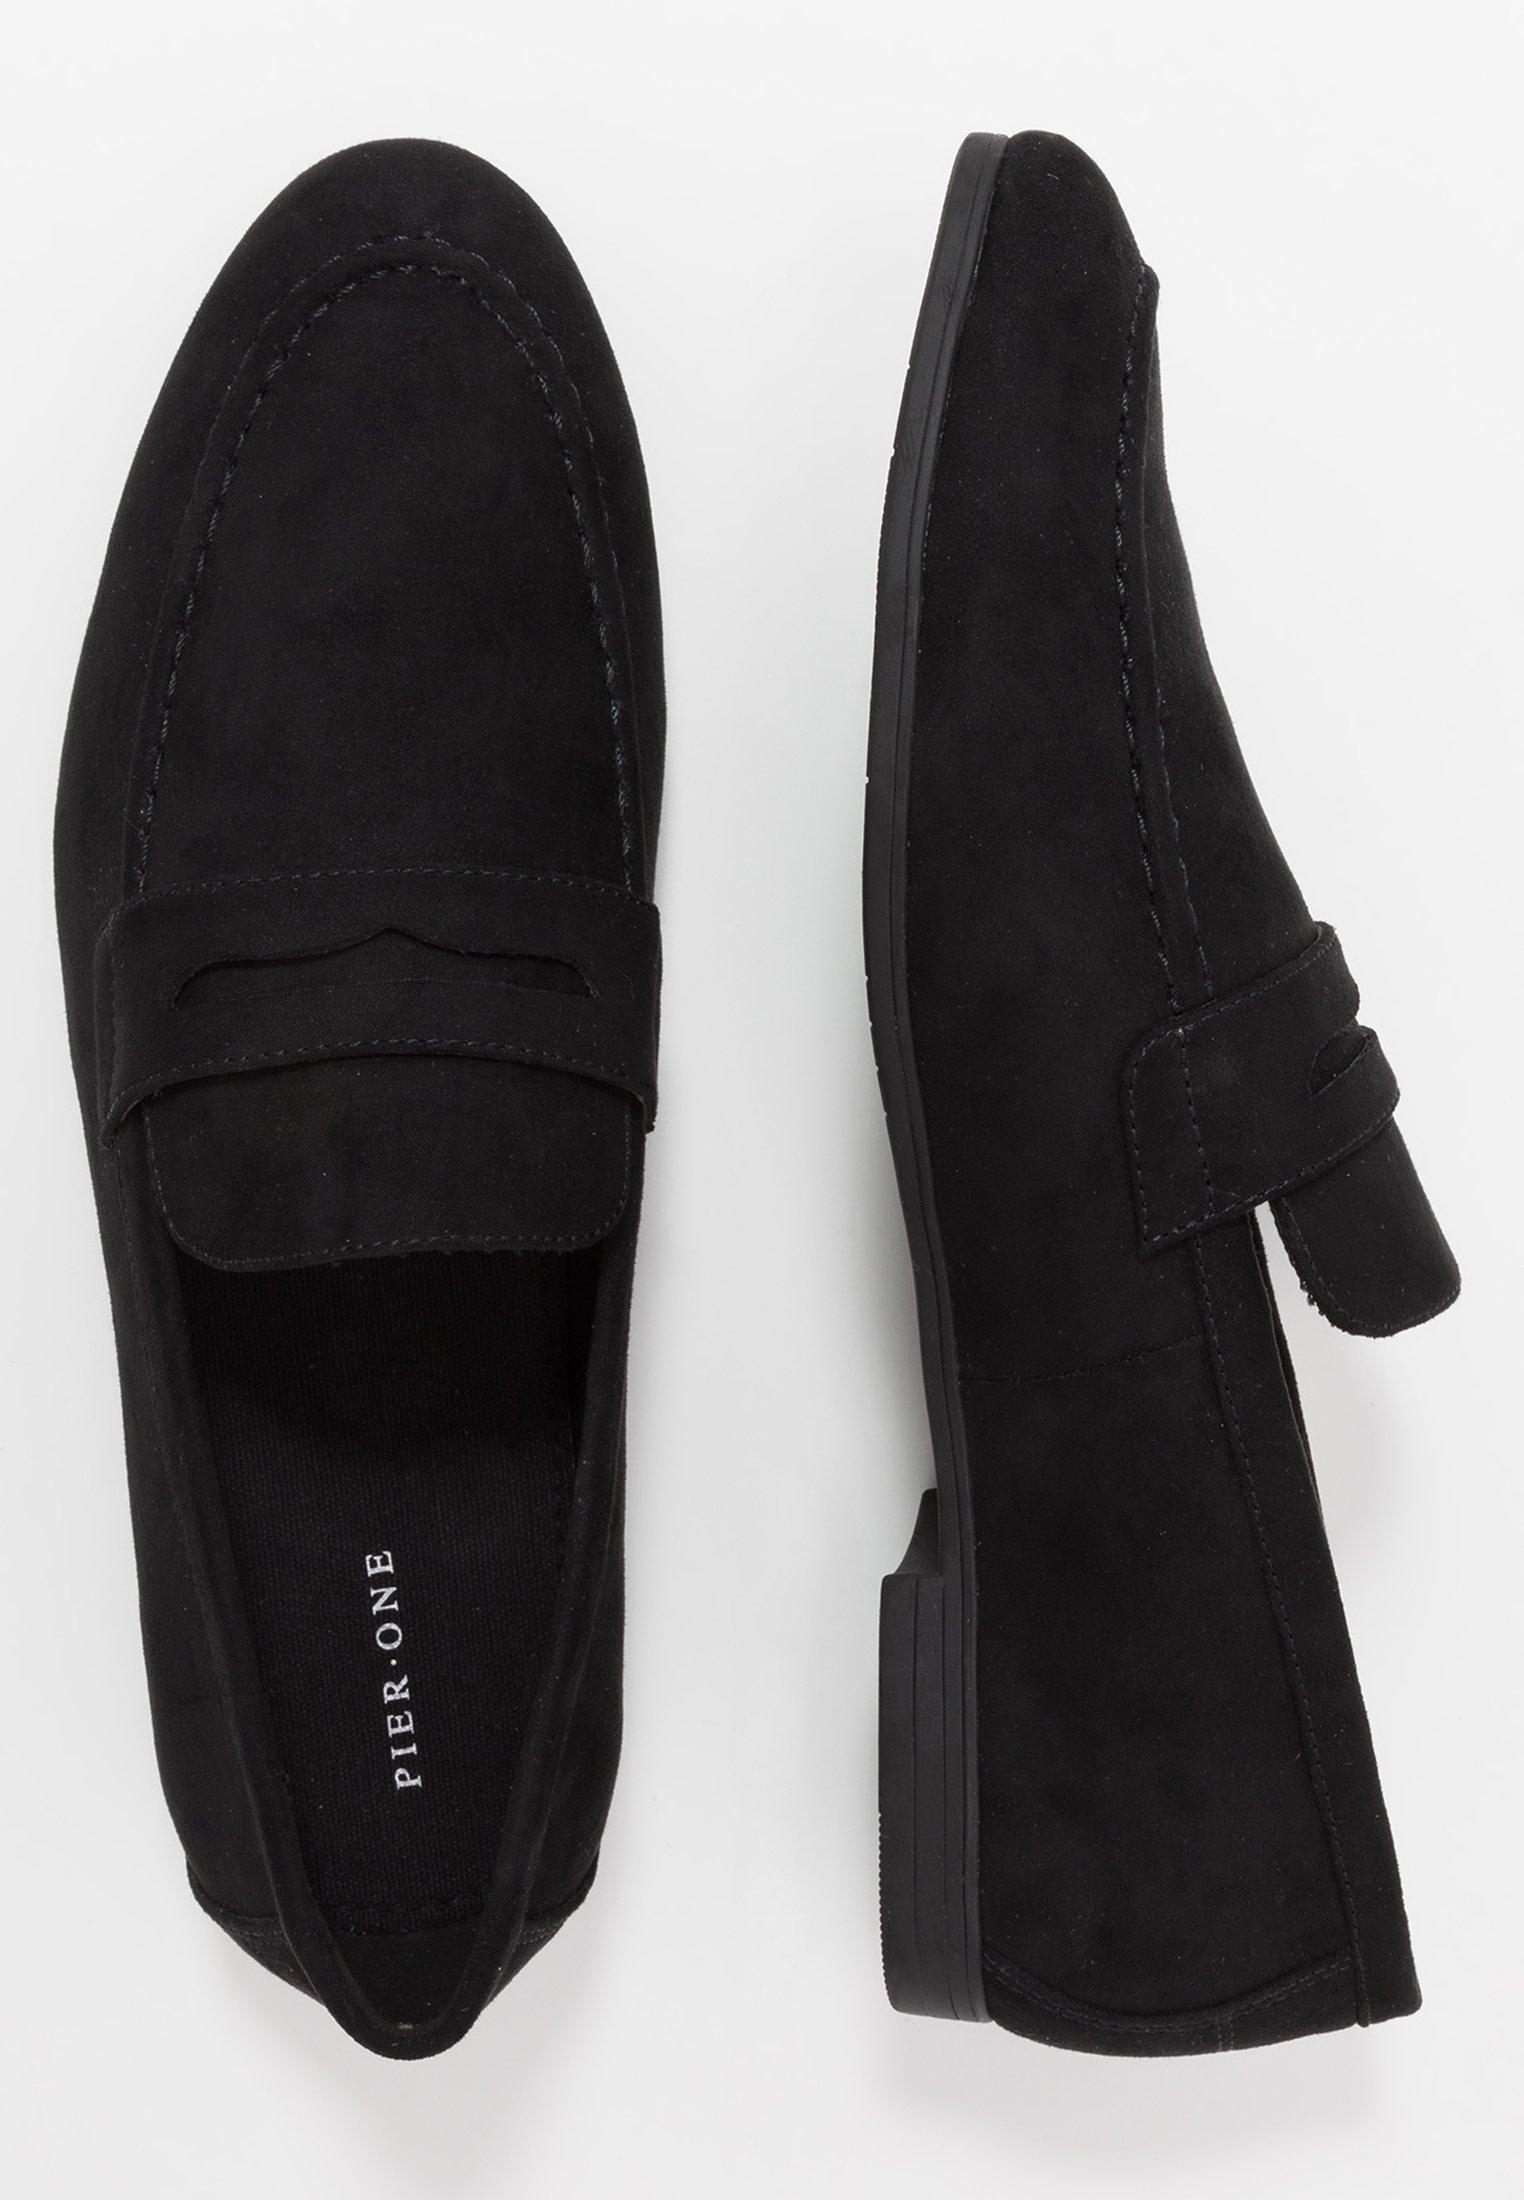 Herrer Business loafers